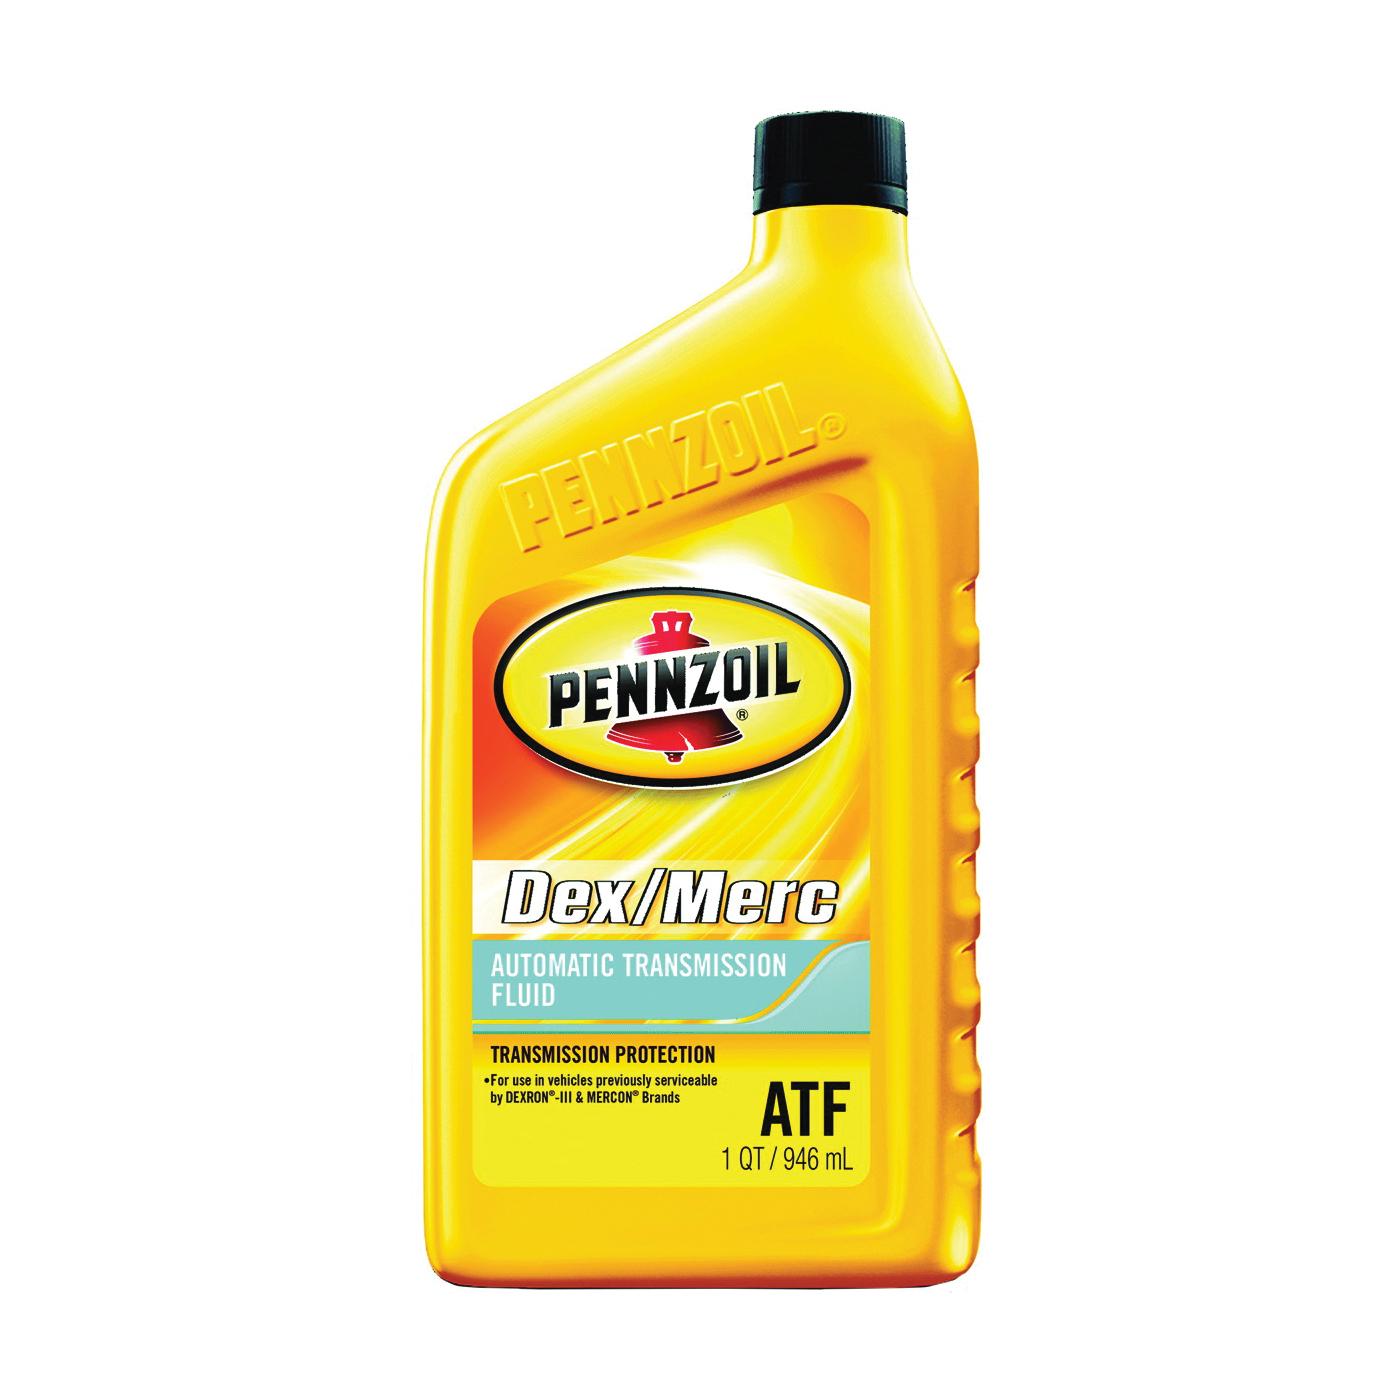 Pennzoil 550042065